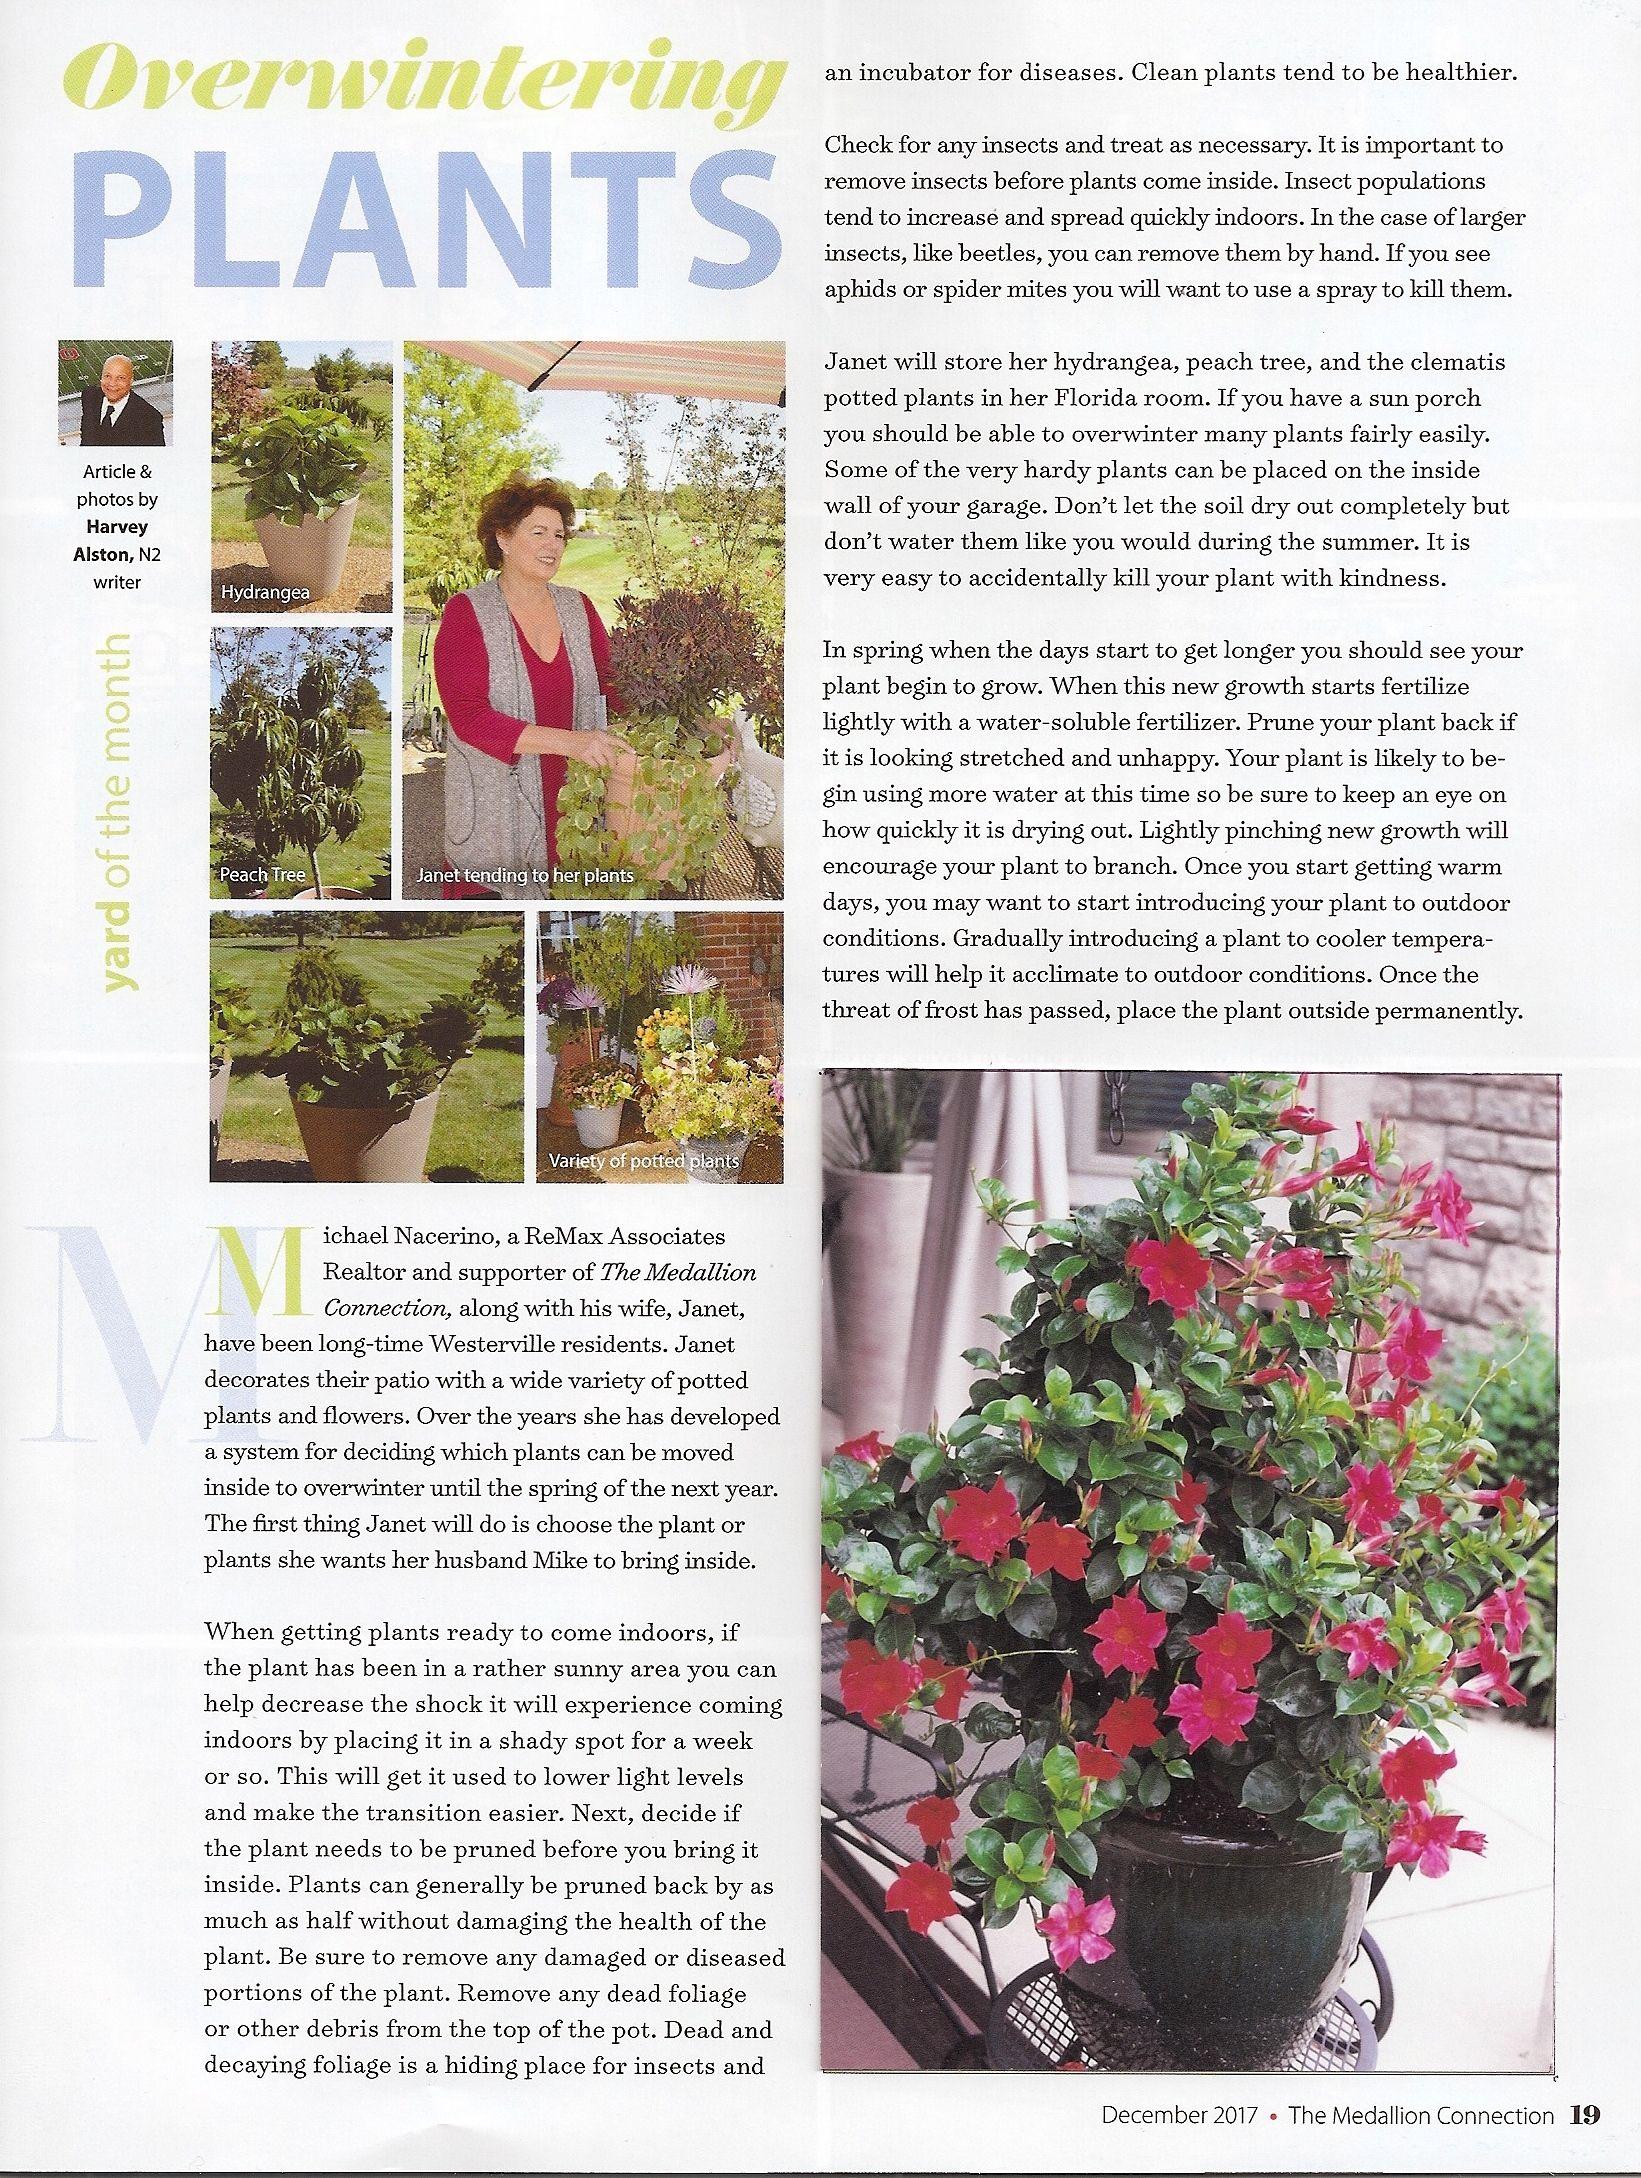 Overwintering Plants | HARVEY ALSTONS ARTICLES | Pinterest ...